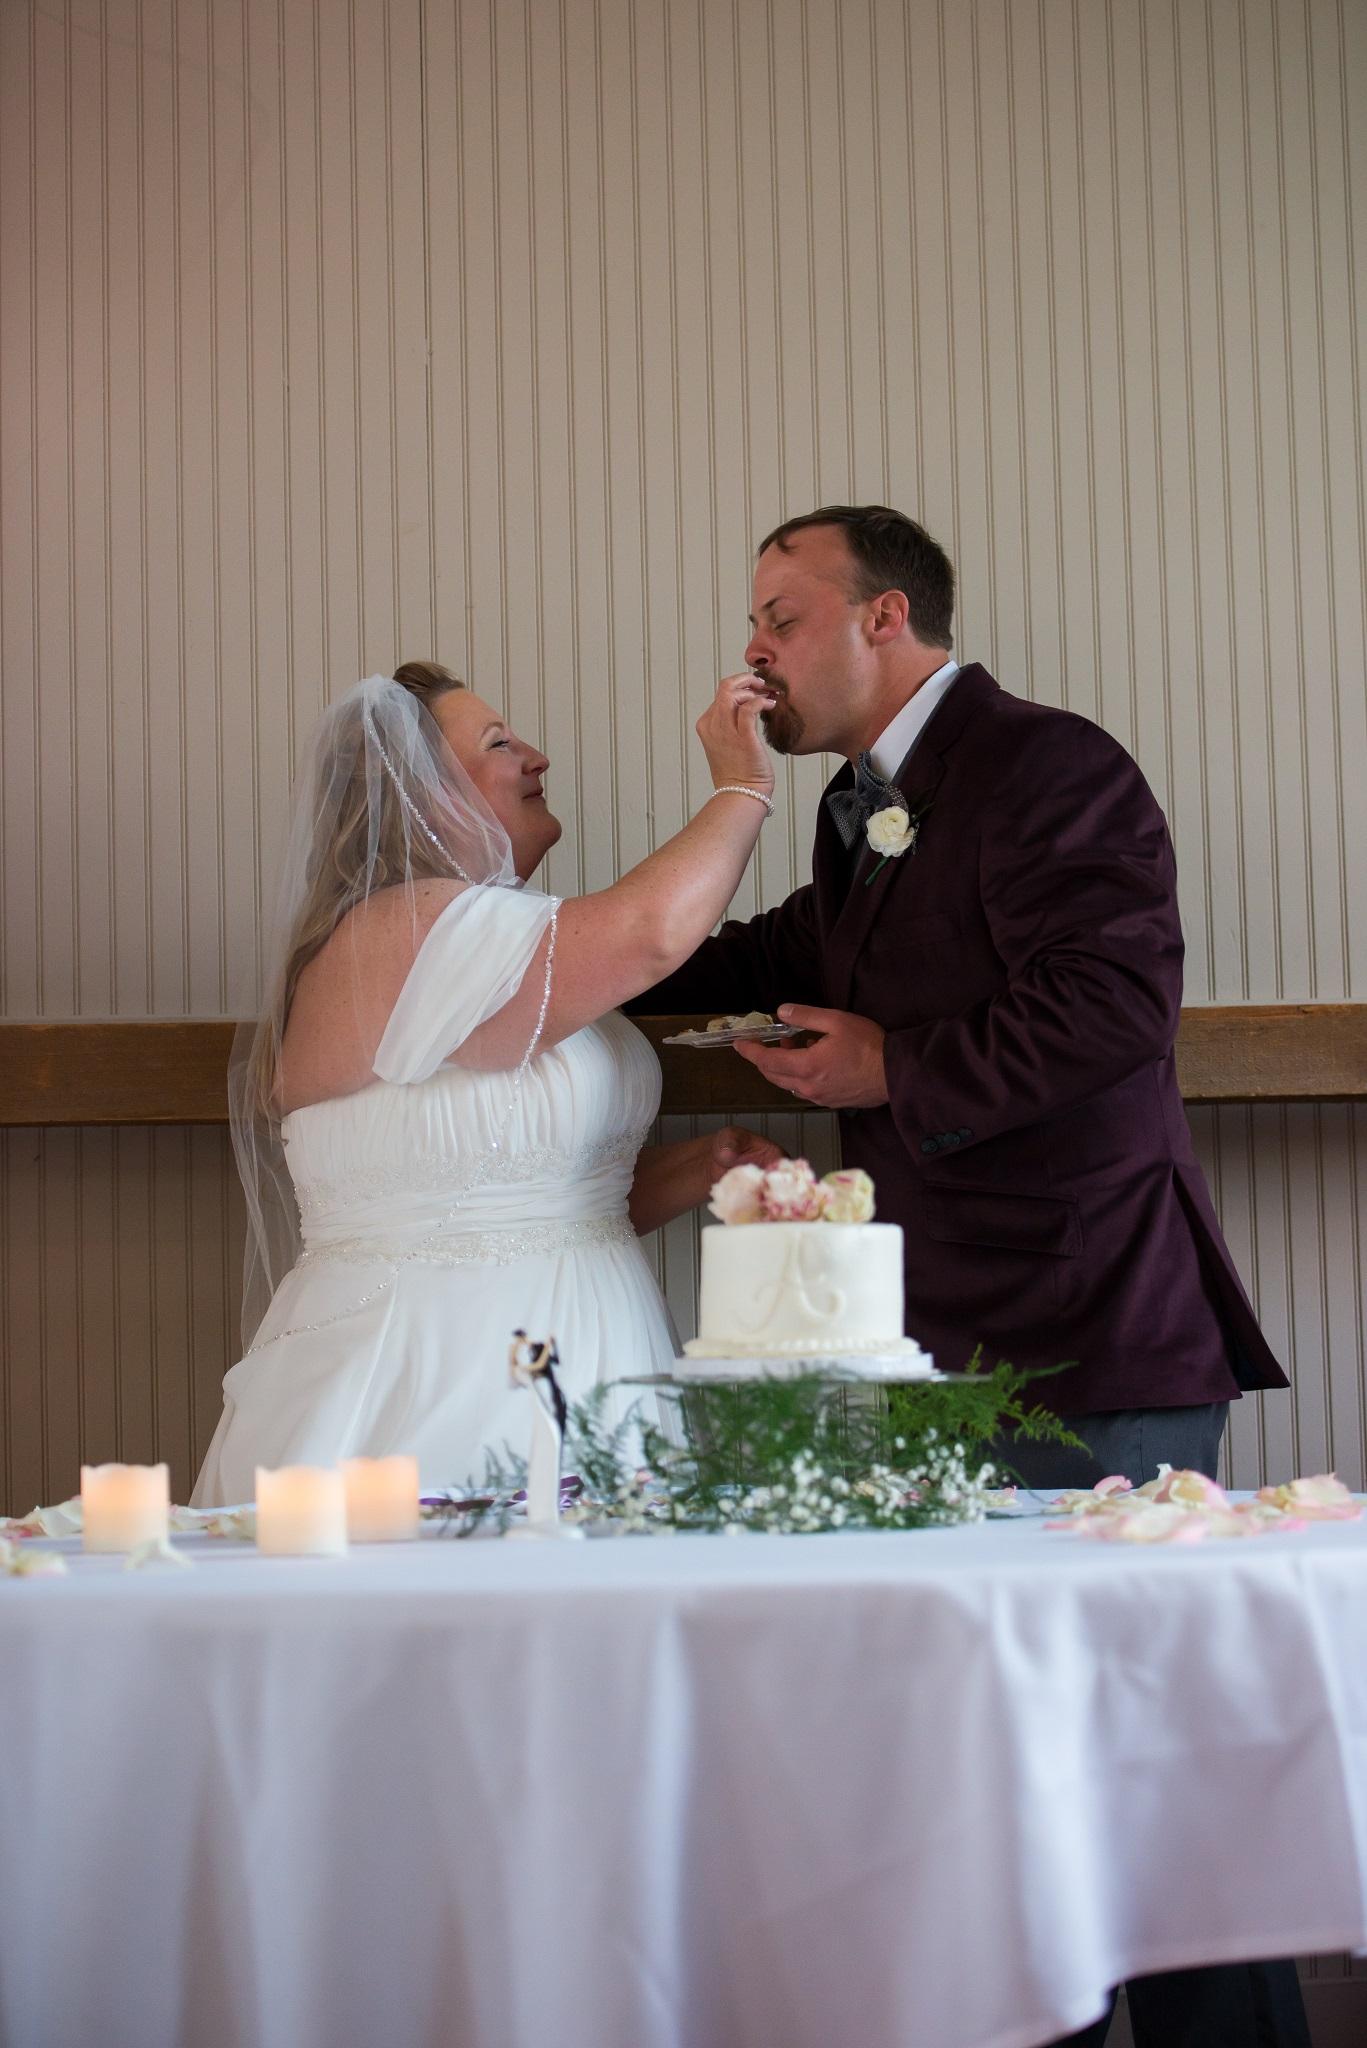 Cincinnati, OH Outdoor Wedding Photography: Matthew and Michelle